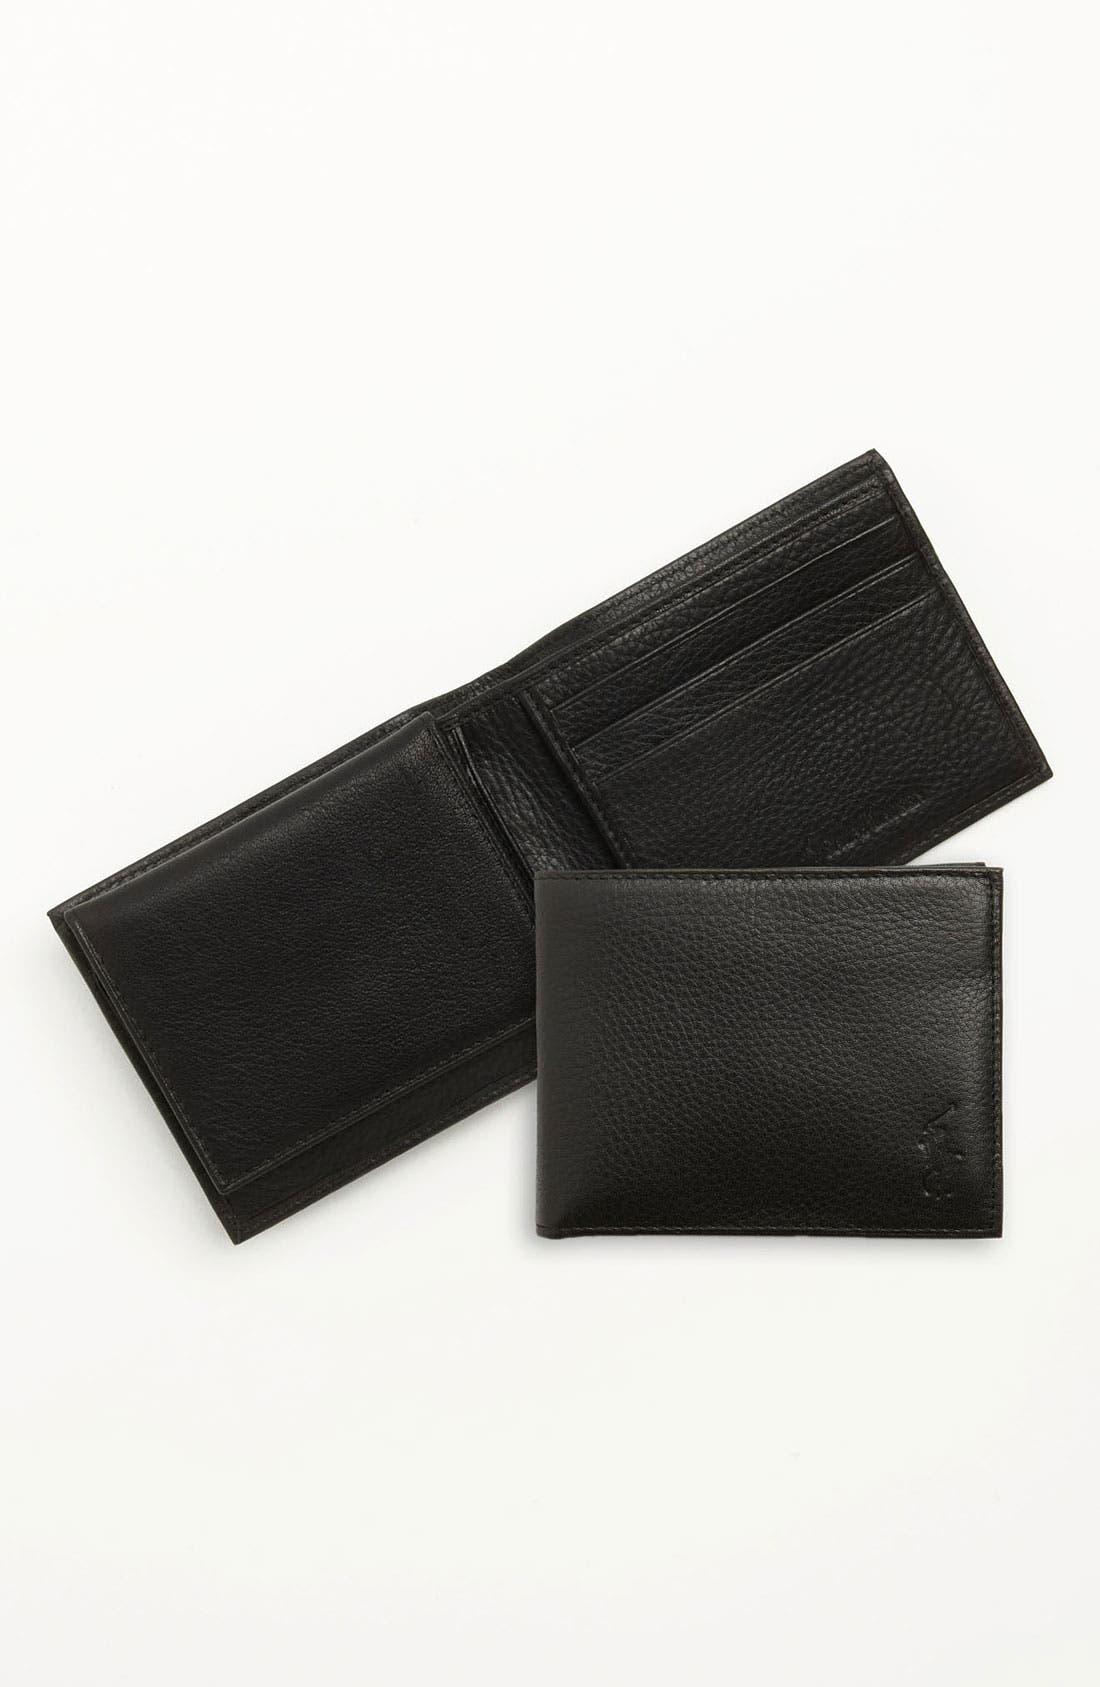 Alternate Image 3  - Polo Ralph Lauren Leather Passcase Wallet